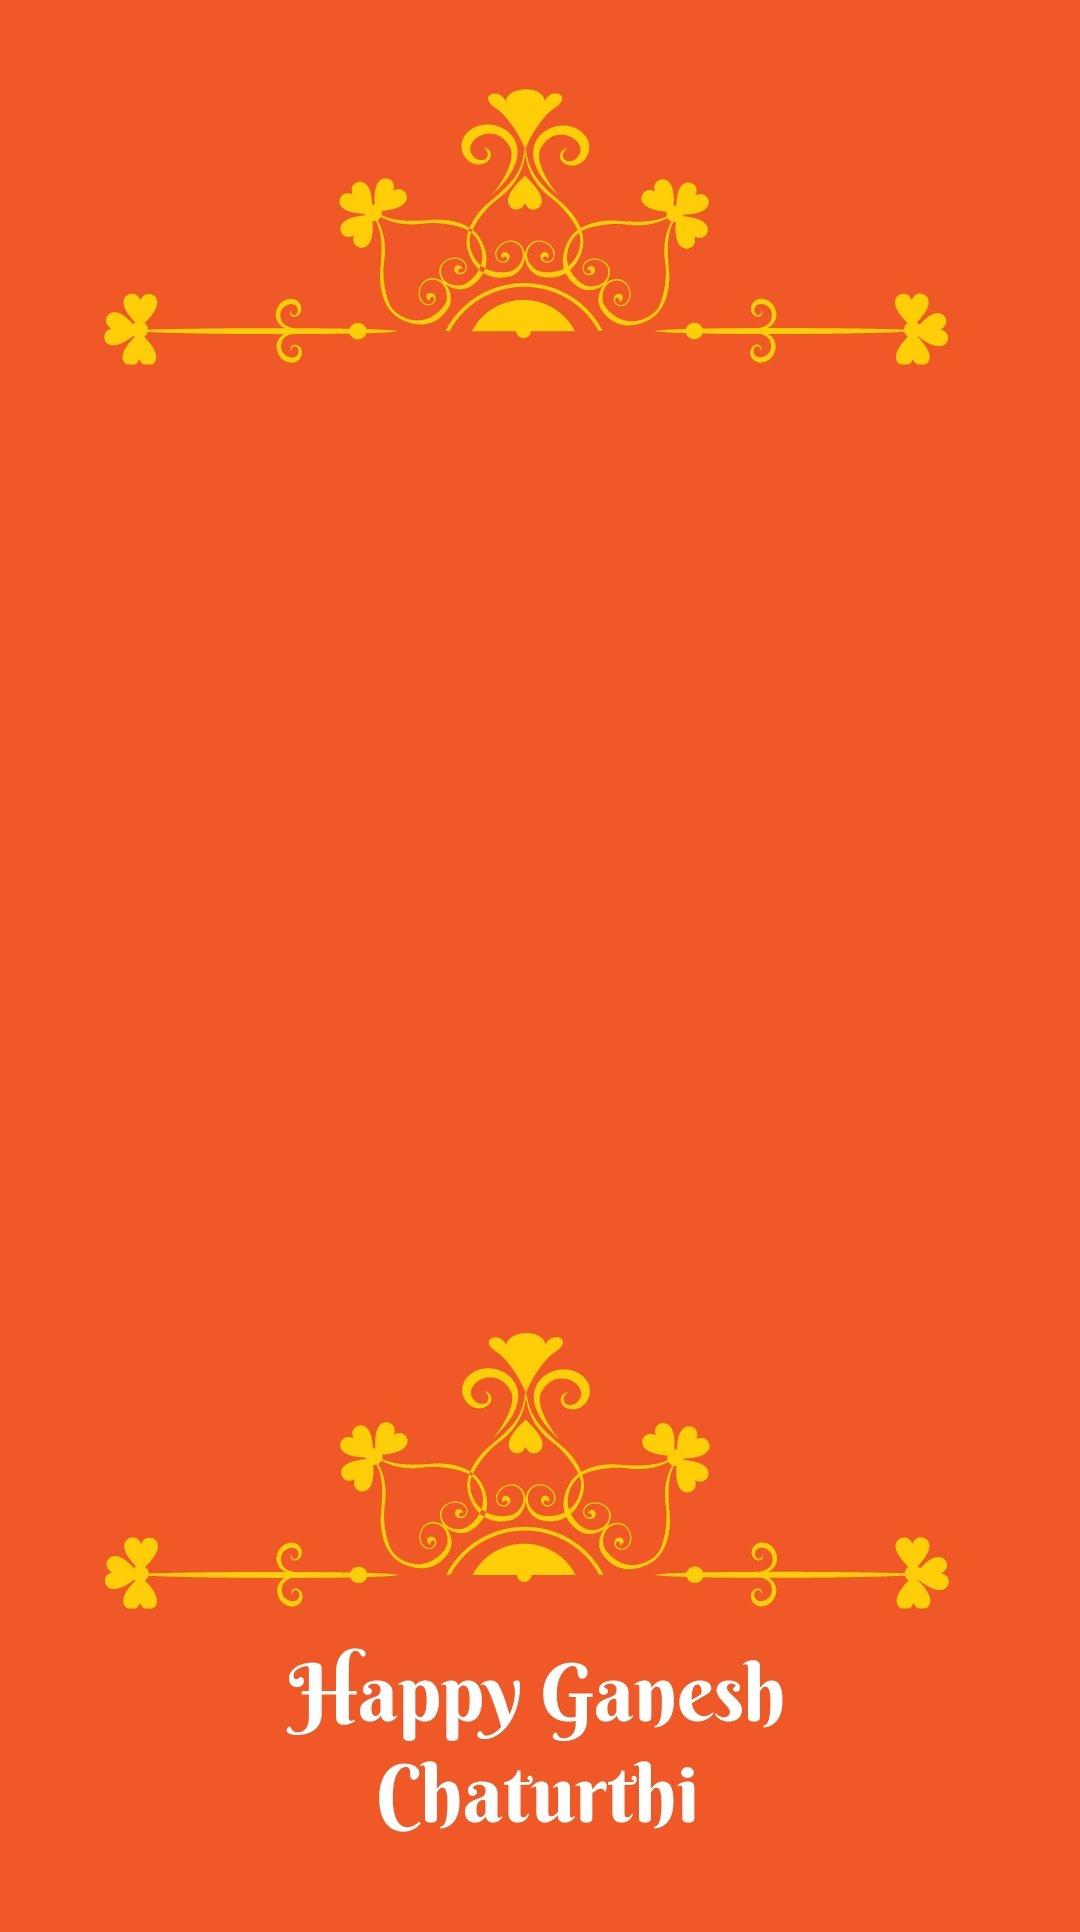 Happy Ganesh Chaturthi Snapchat Geofilter Template.jpe